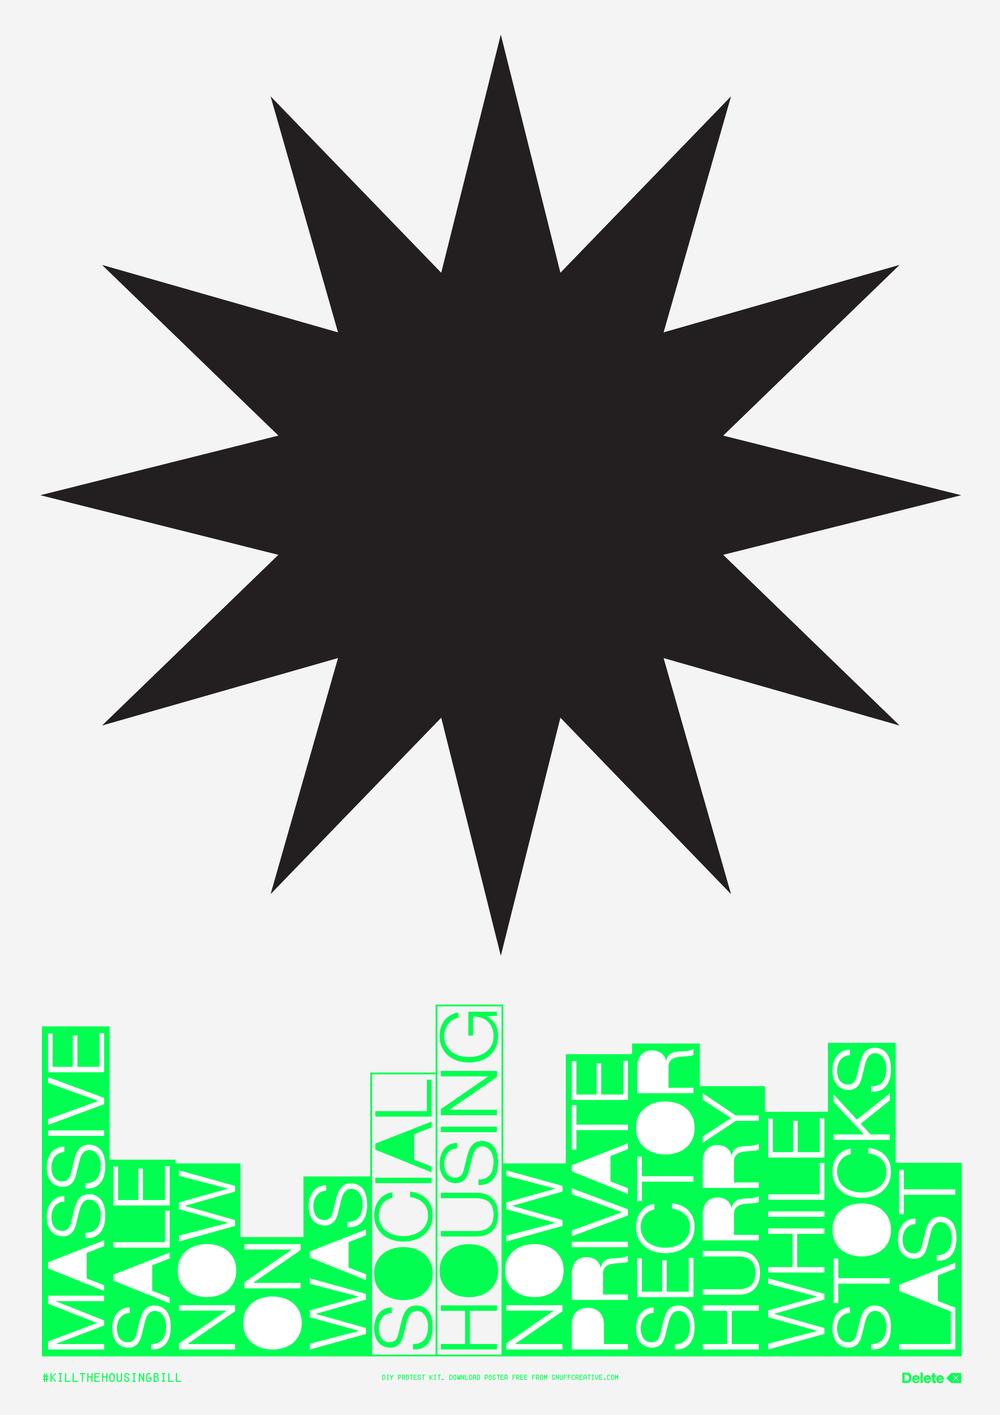 MASSIVE SALE TYPE POSTER_BLACK&GREY1-01.jpg